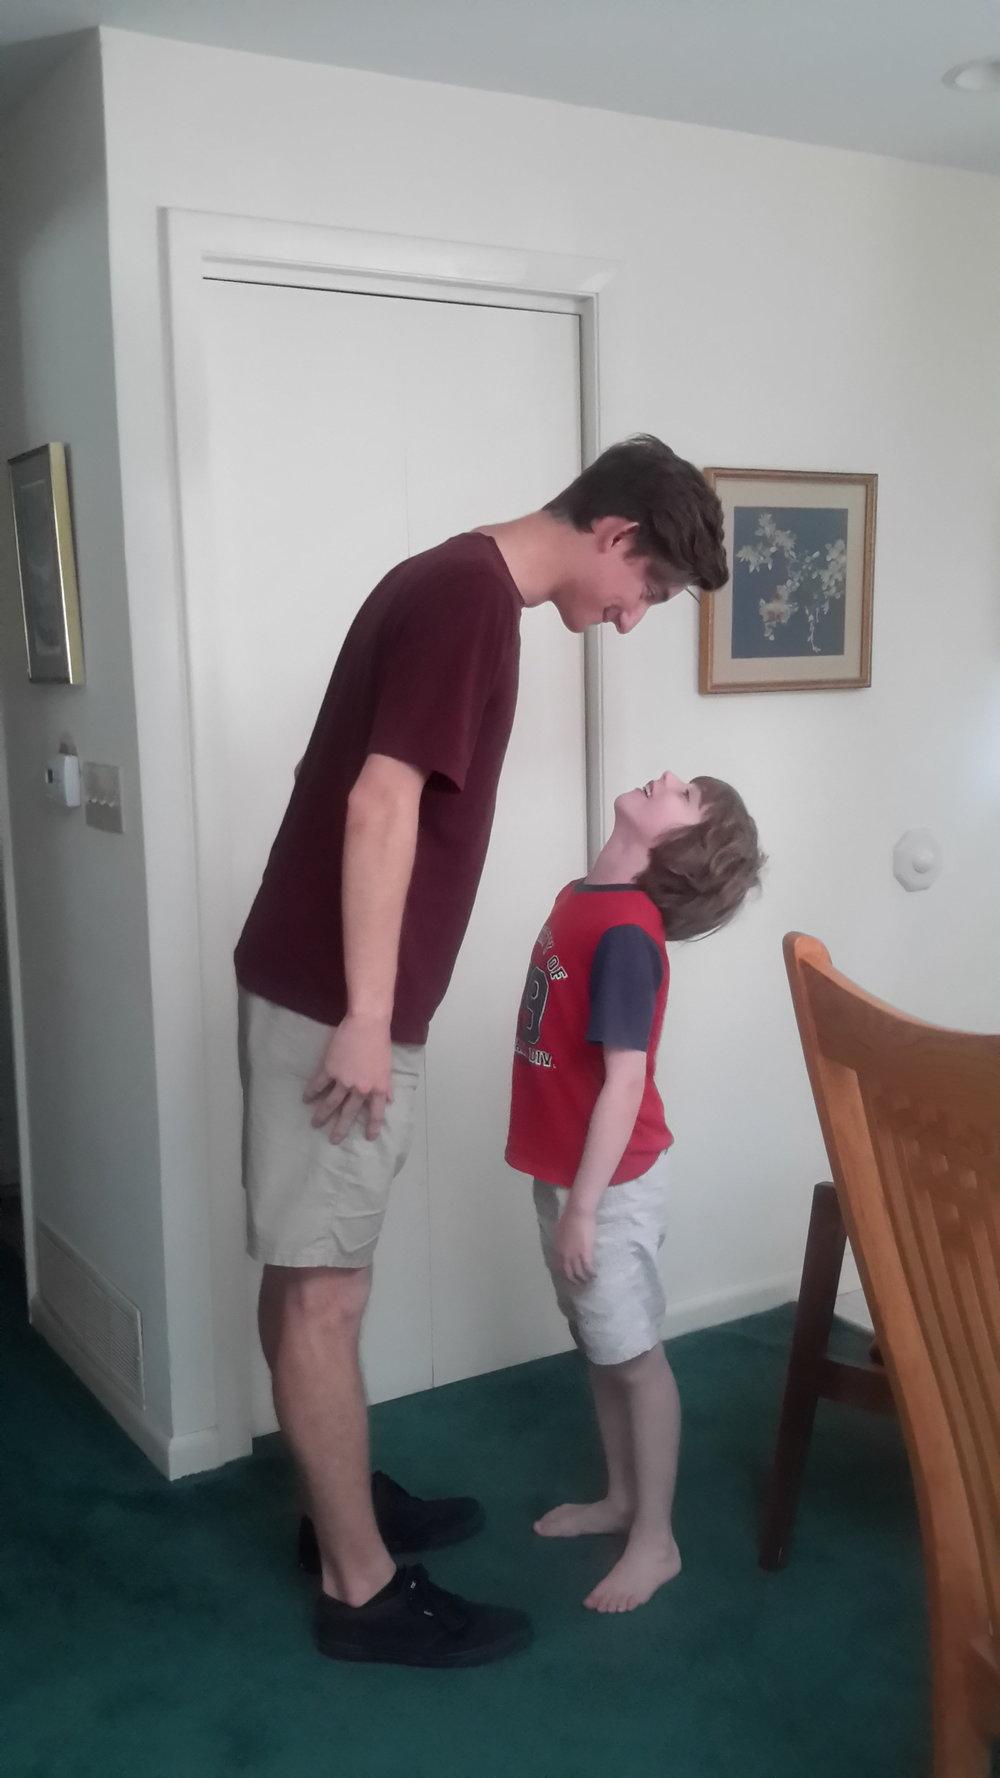 Future Voters - Nicholas (18) and Jasper (7)